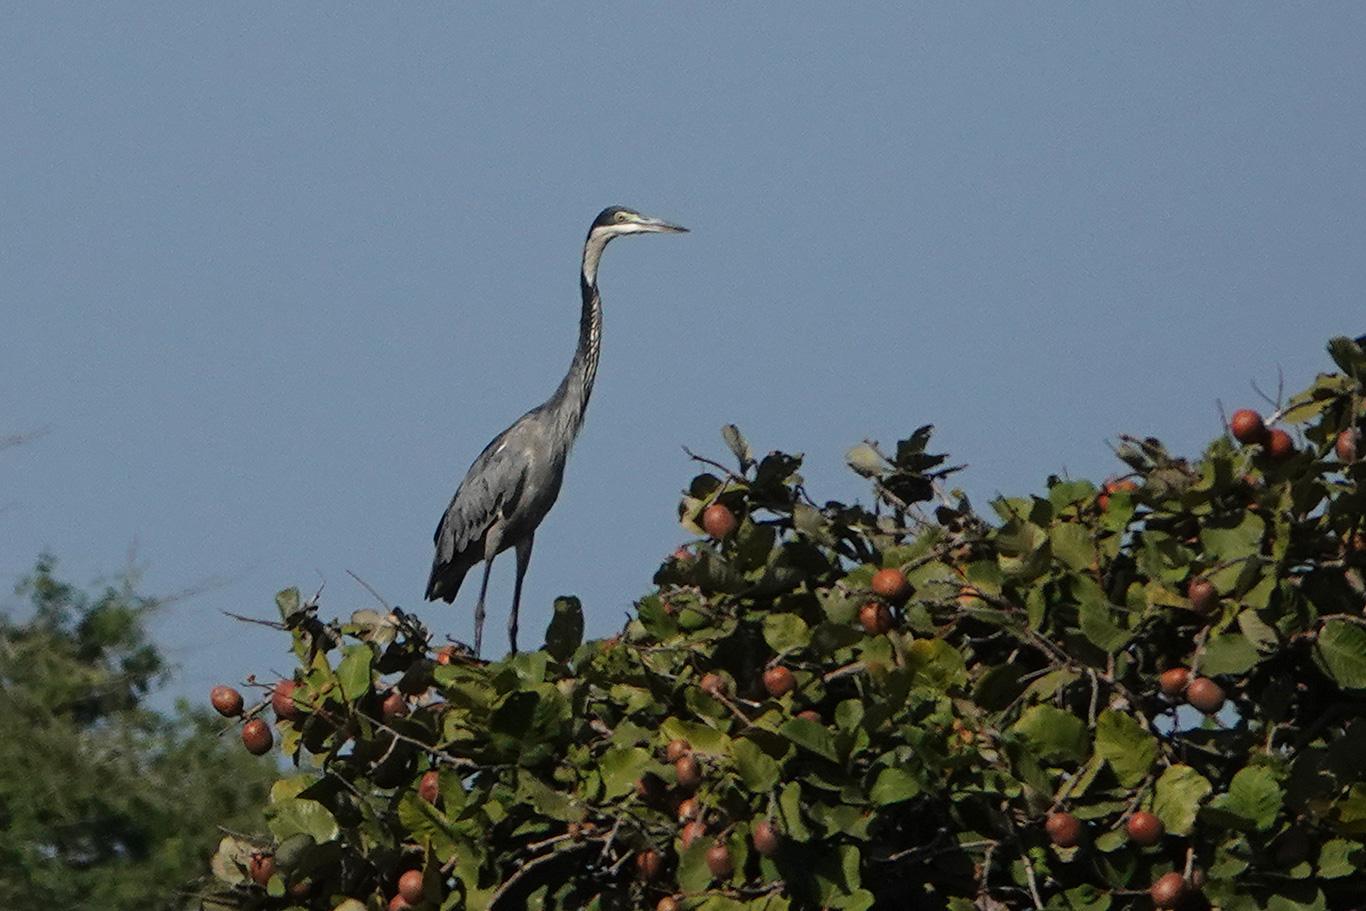 Black-headed Heron, Kartong, The Gambia.